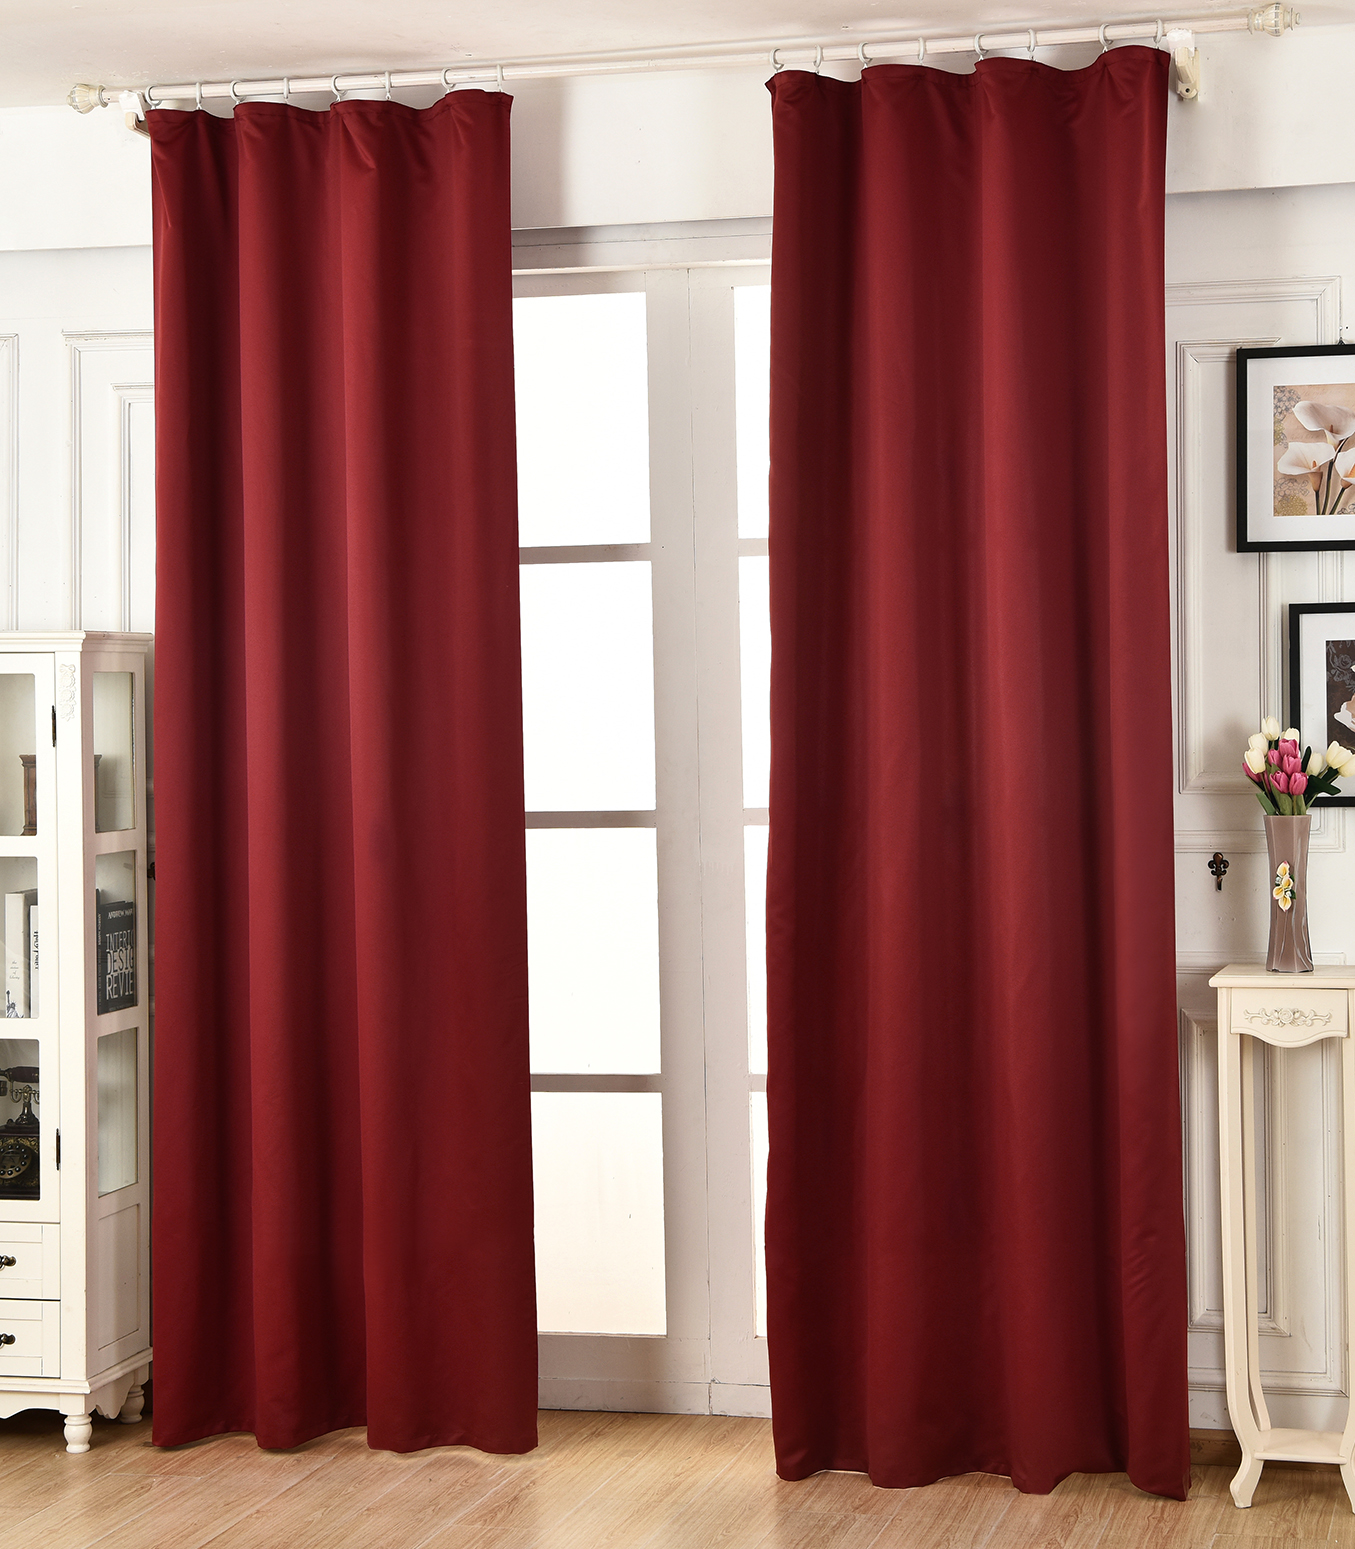 vorhang blickdicht leicht verdunkelung gardinen mit kr uselband matt crush 489 ebay. Black Bedroom Furniture Sets. Home Design Ideas